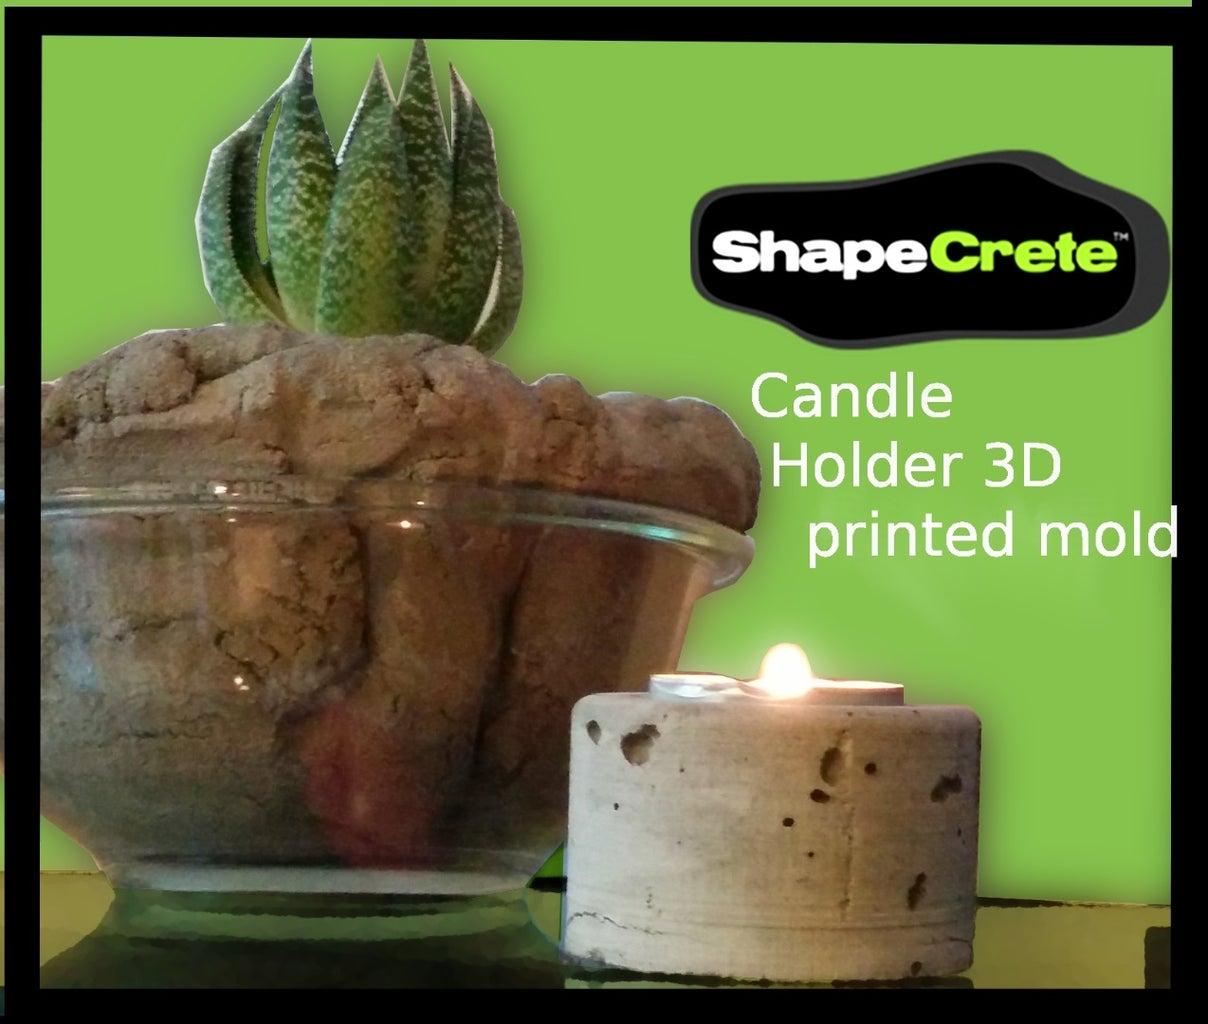 ShapeCrete-3D Printed Mold for a Votive Candle Holder